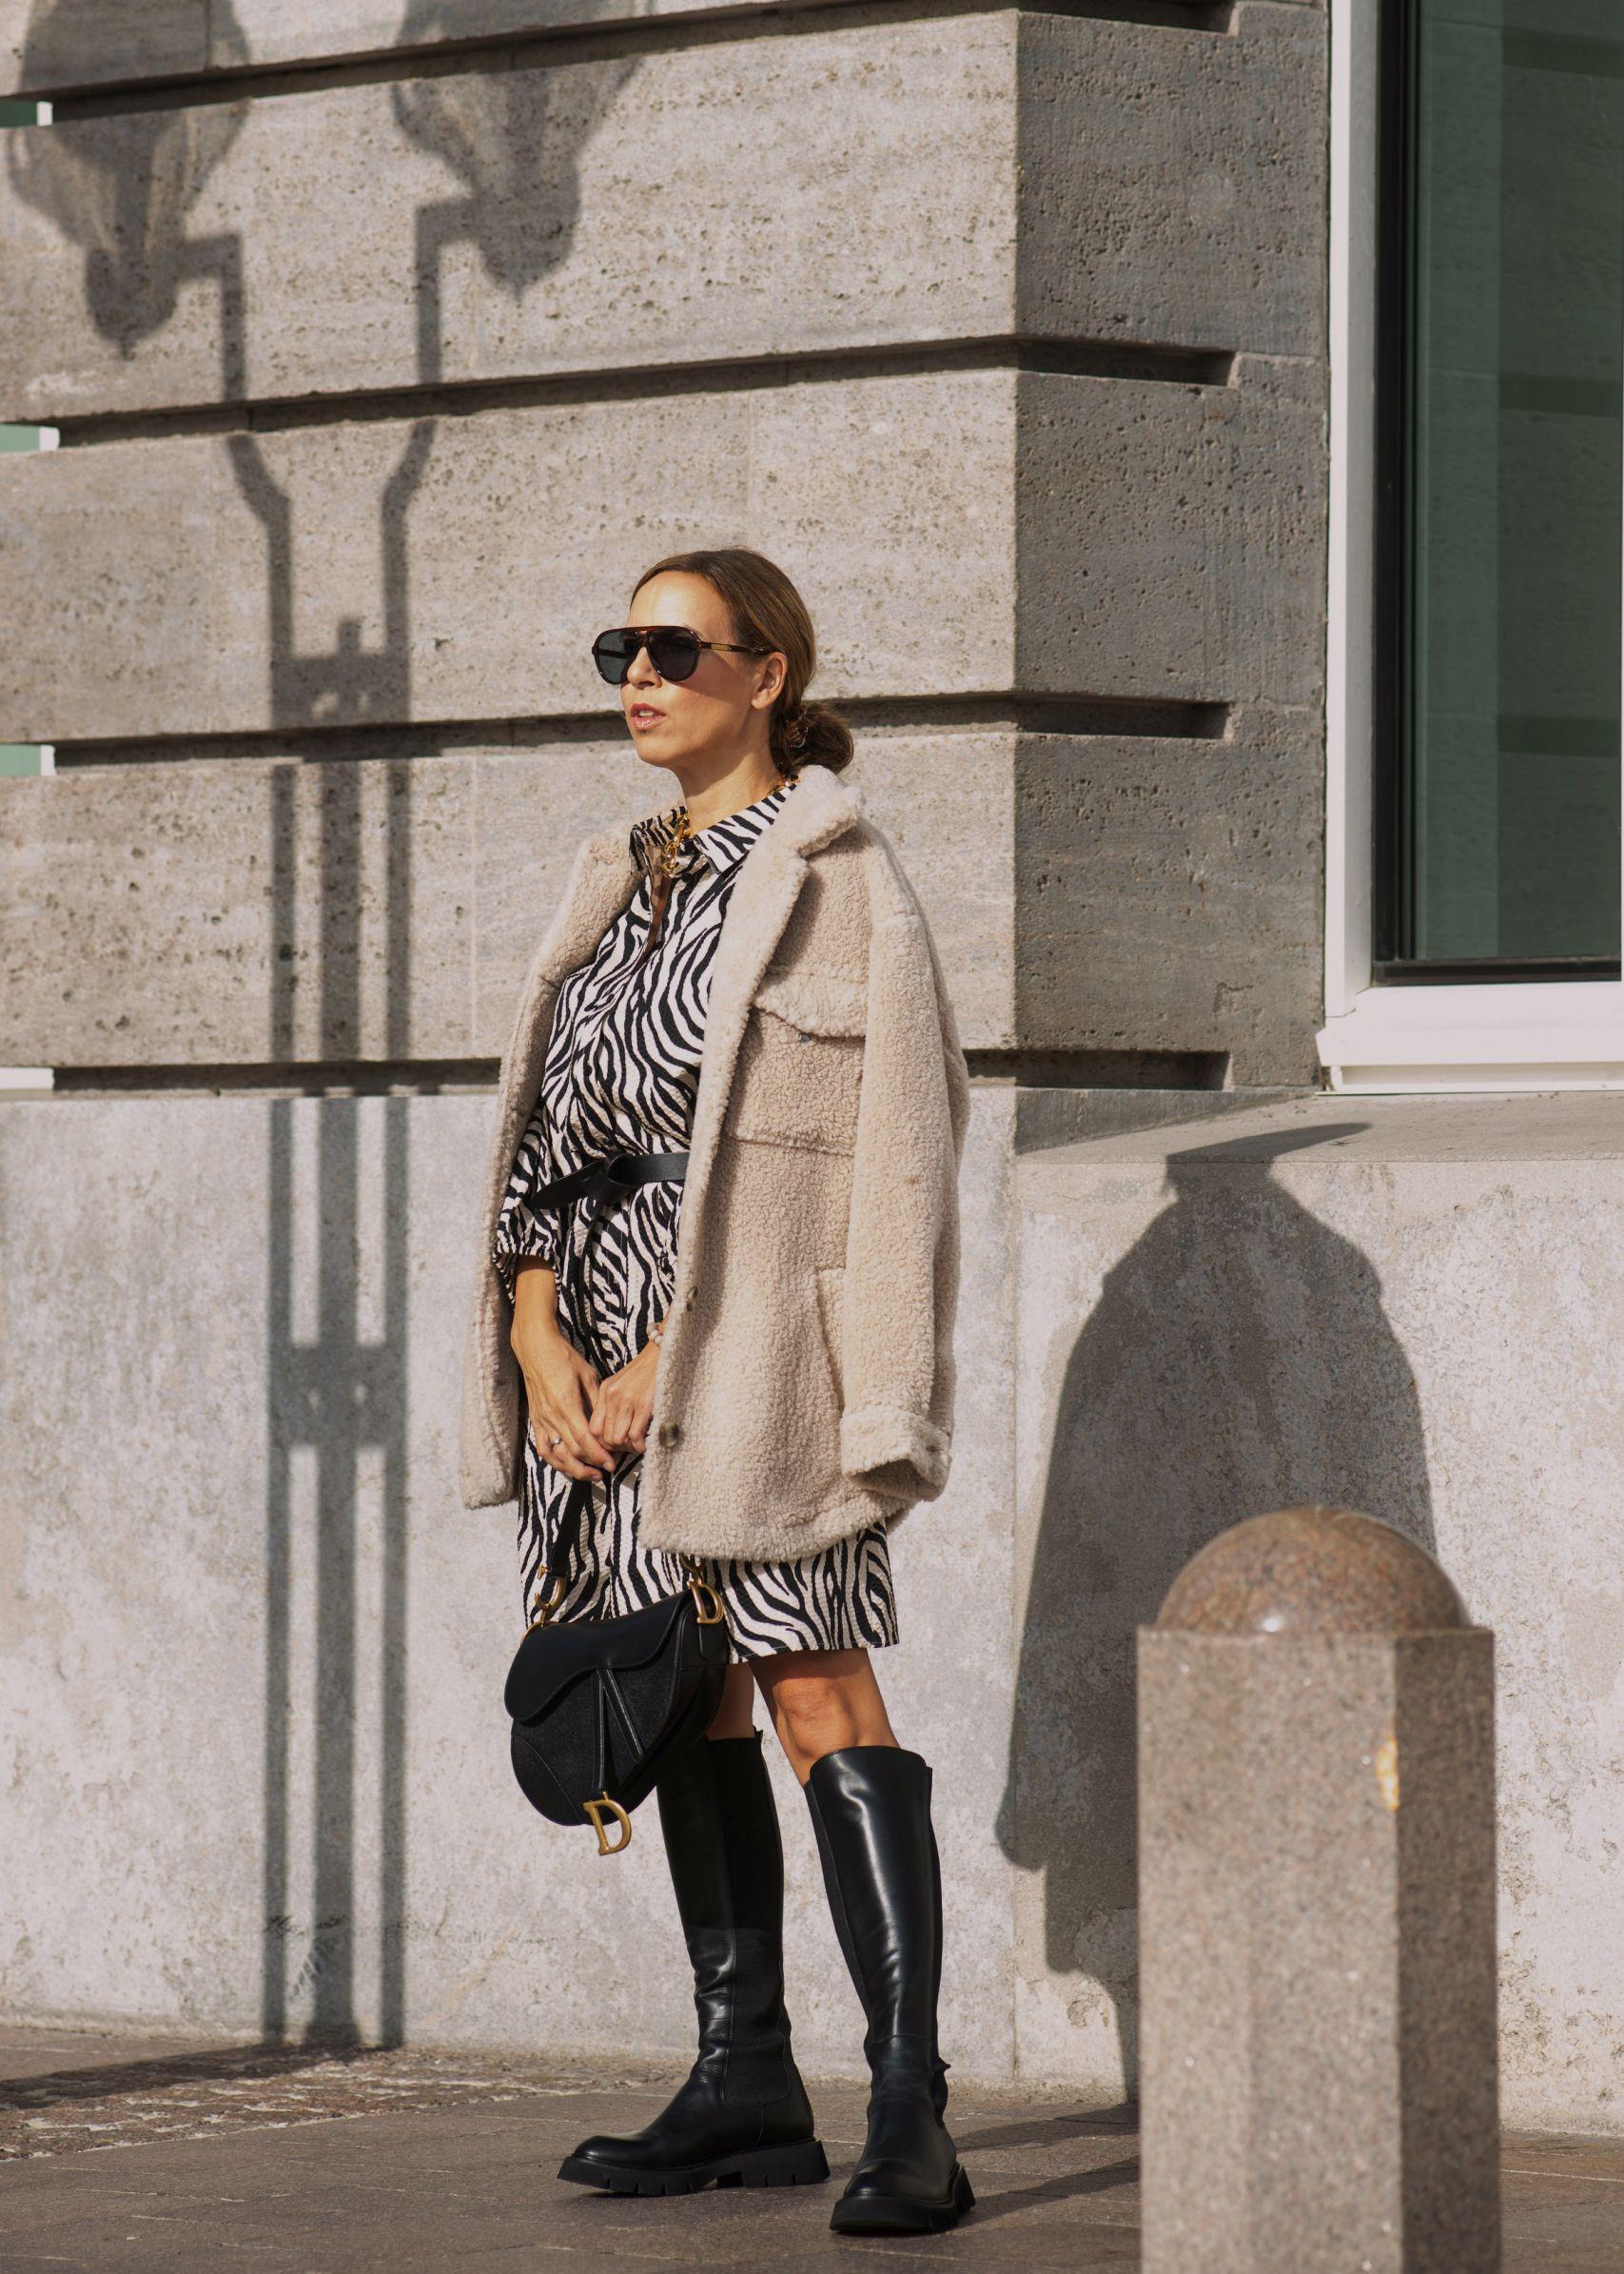 Raffaele Riccardi Stiefel zum Zebra Kleid und Dior Saddle Bag